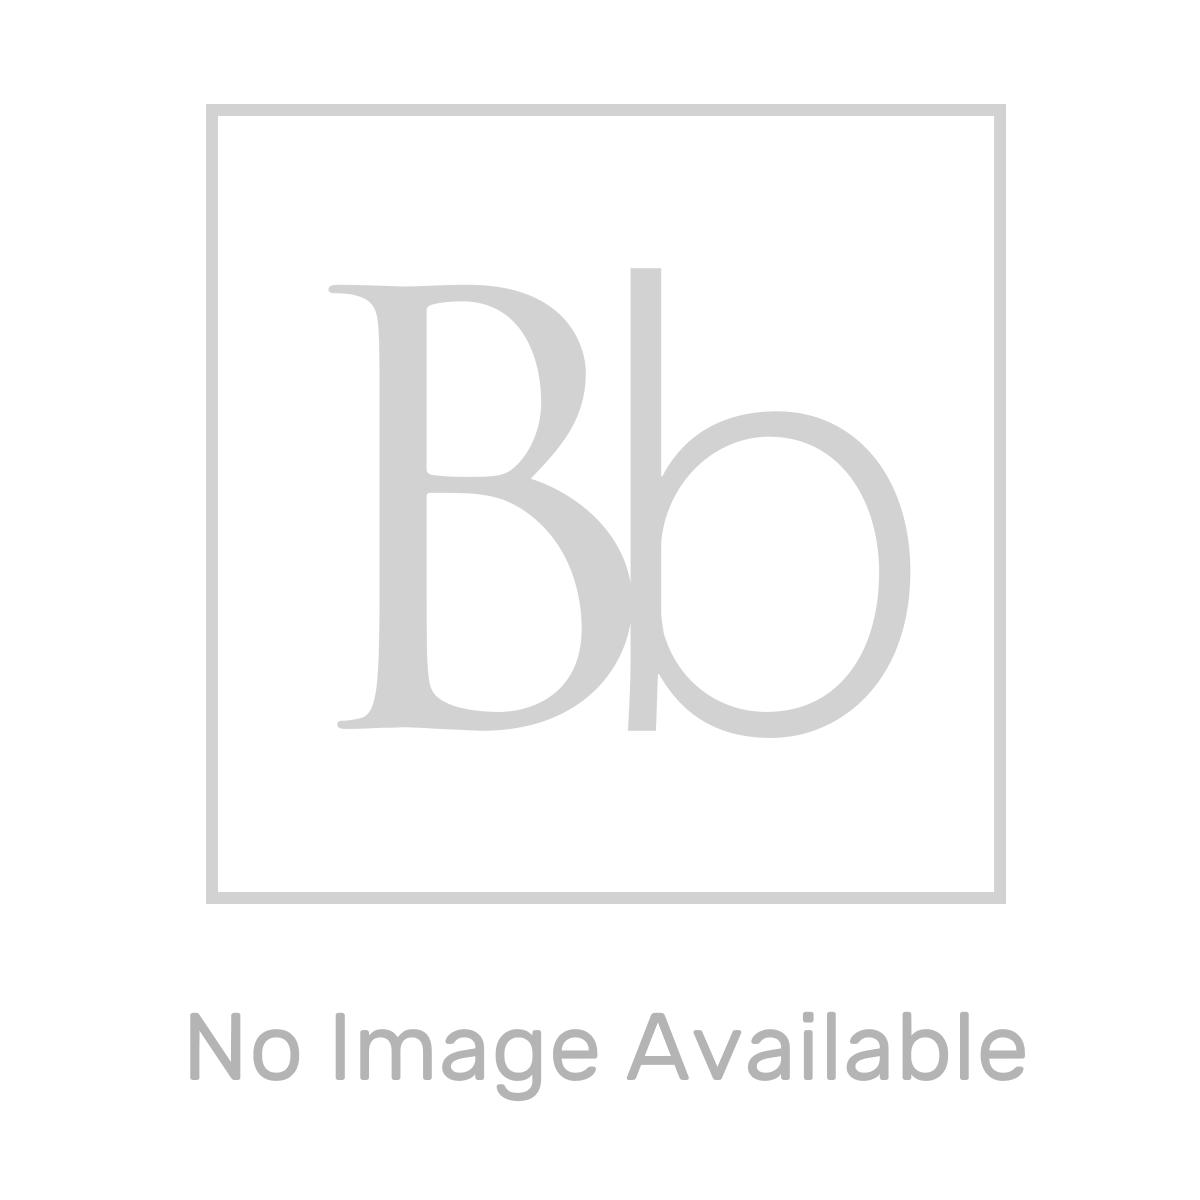 Mito Wall Hung Vanity Unit 500mm Lifestyle